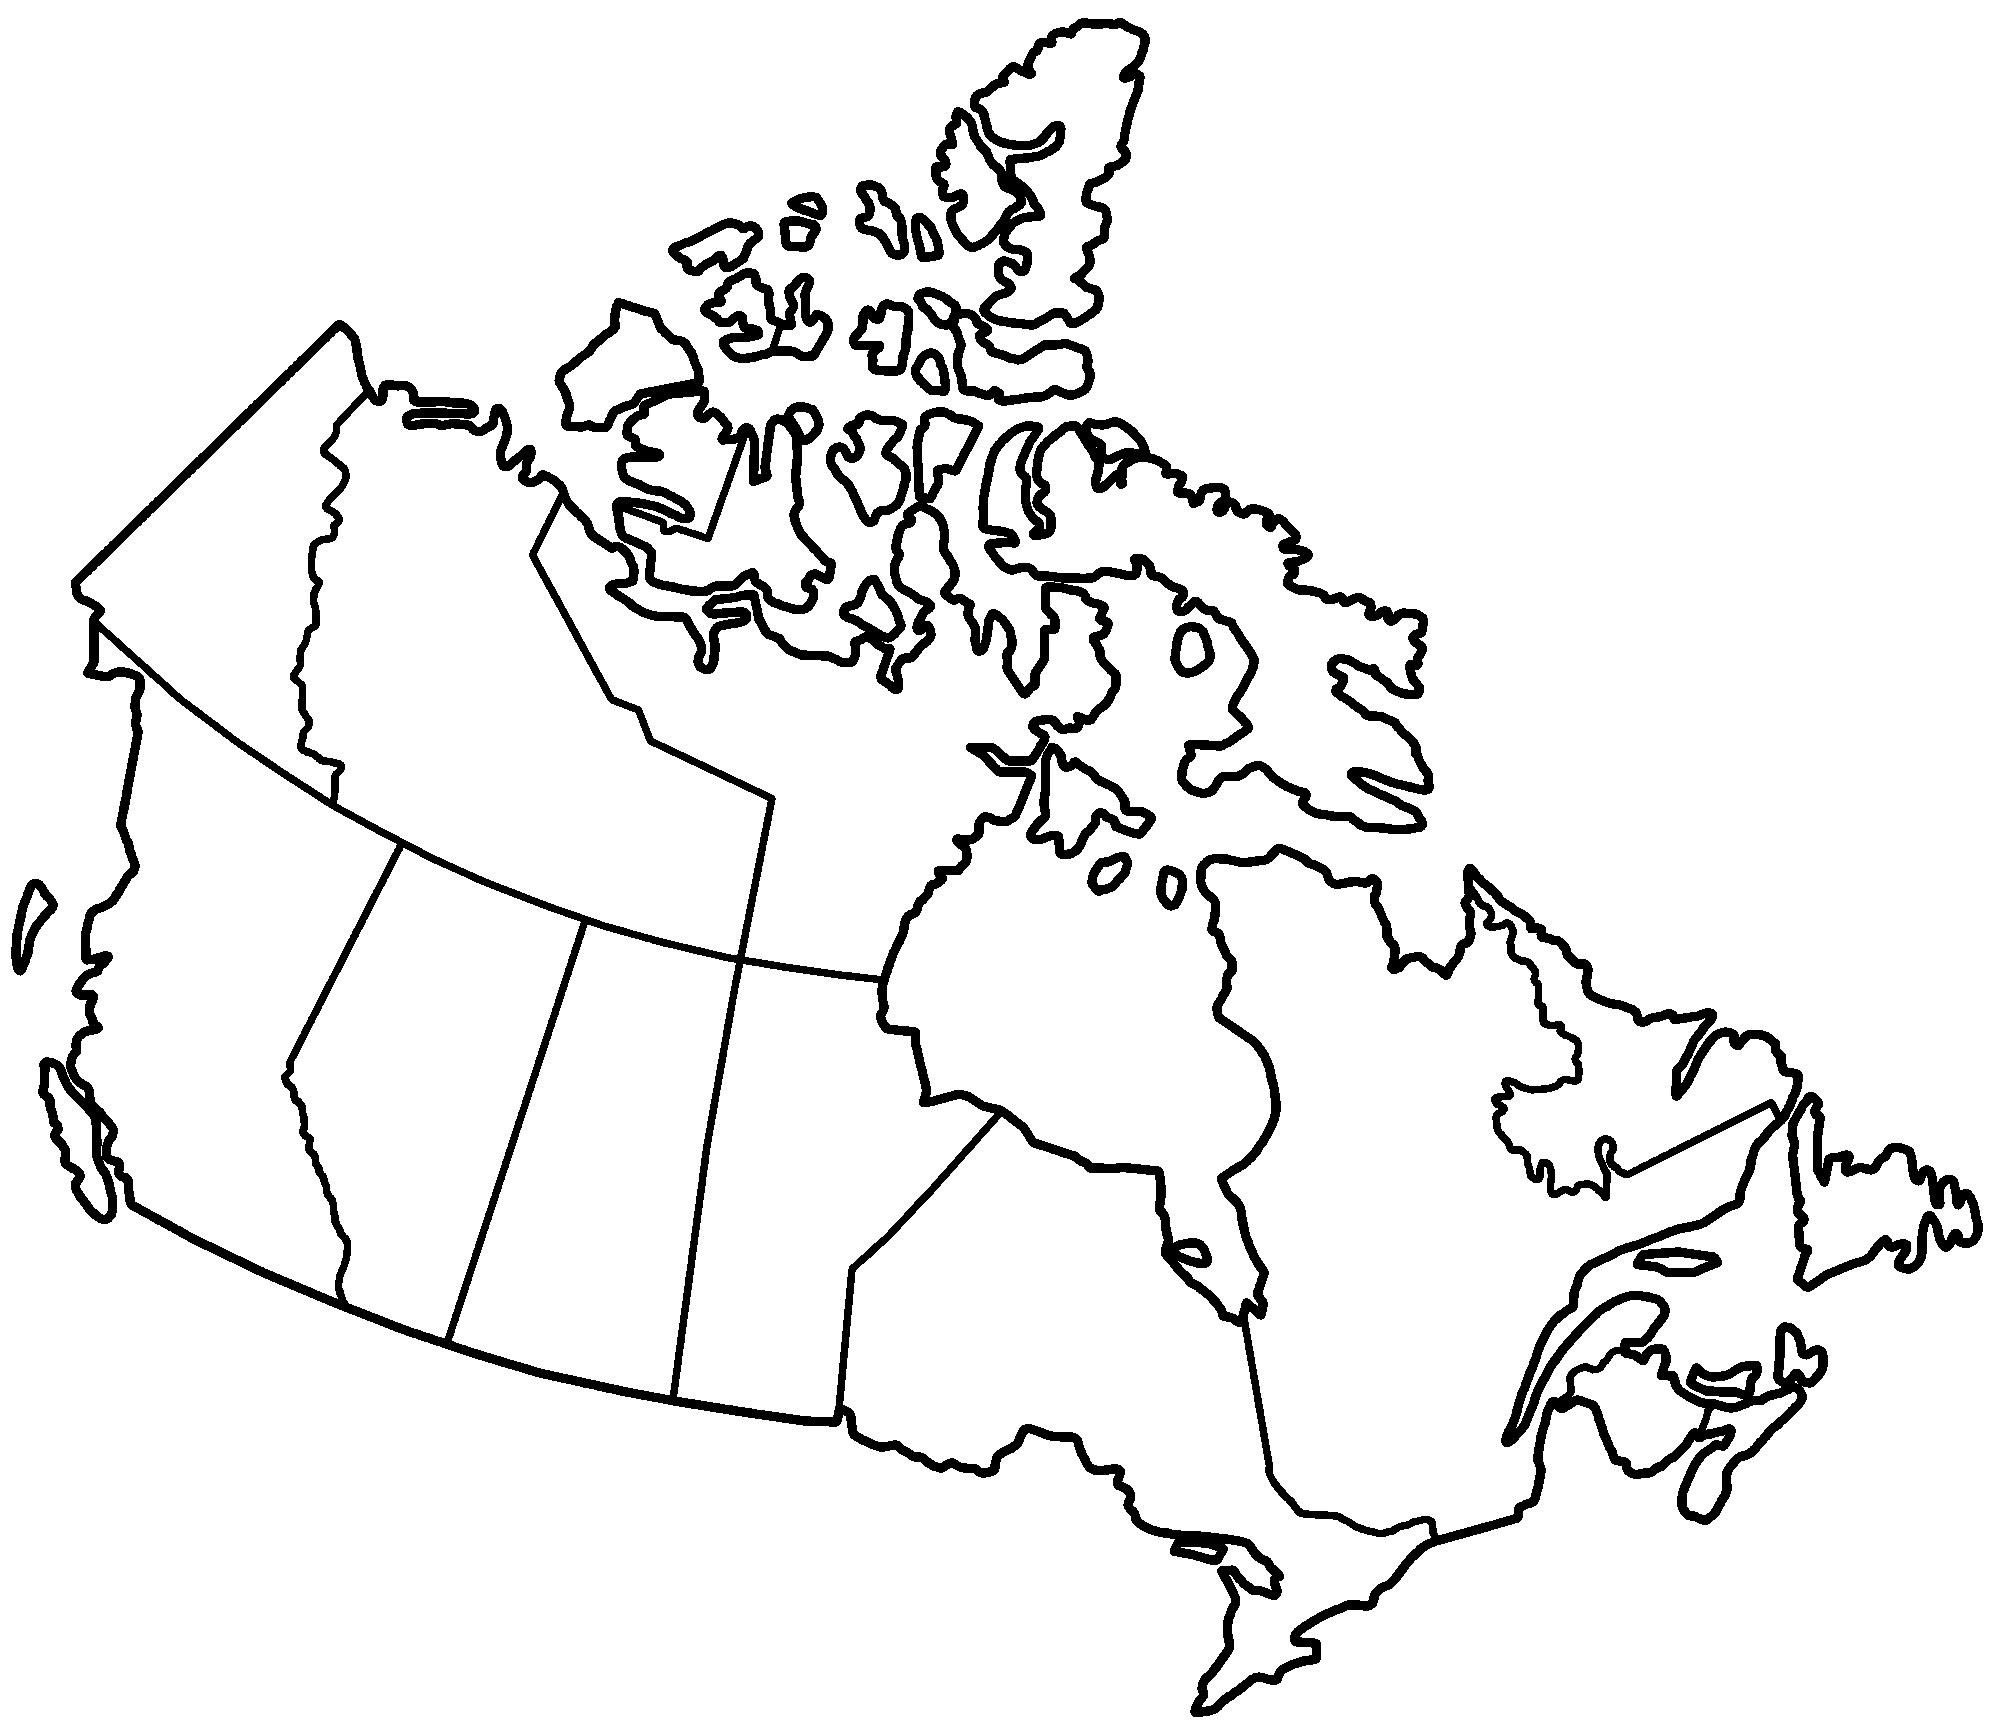 Canada Provinces Blank Mapsof